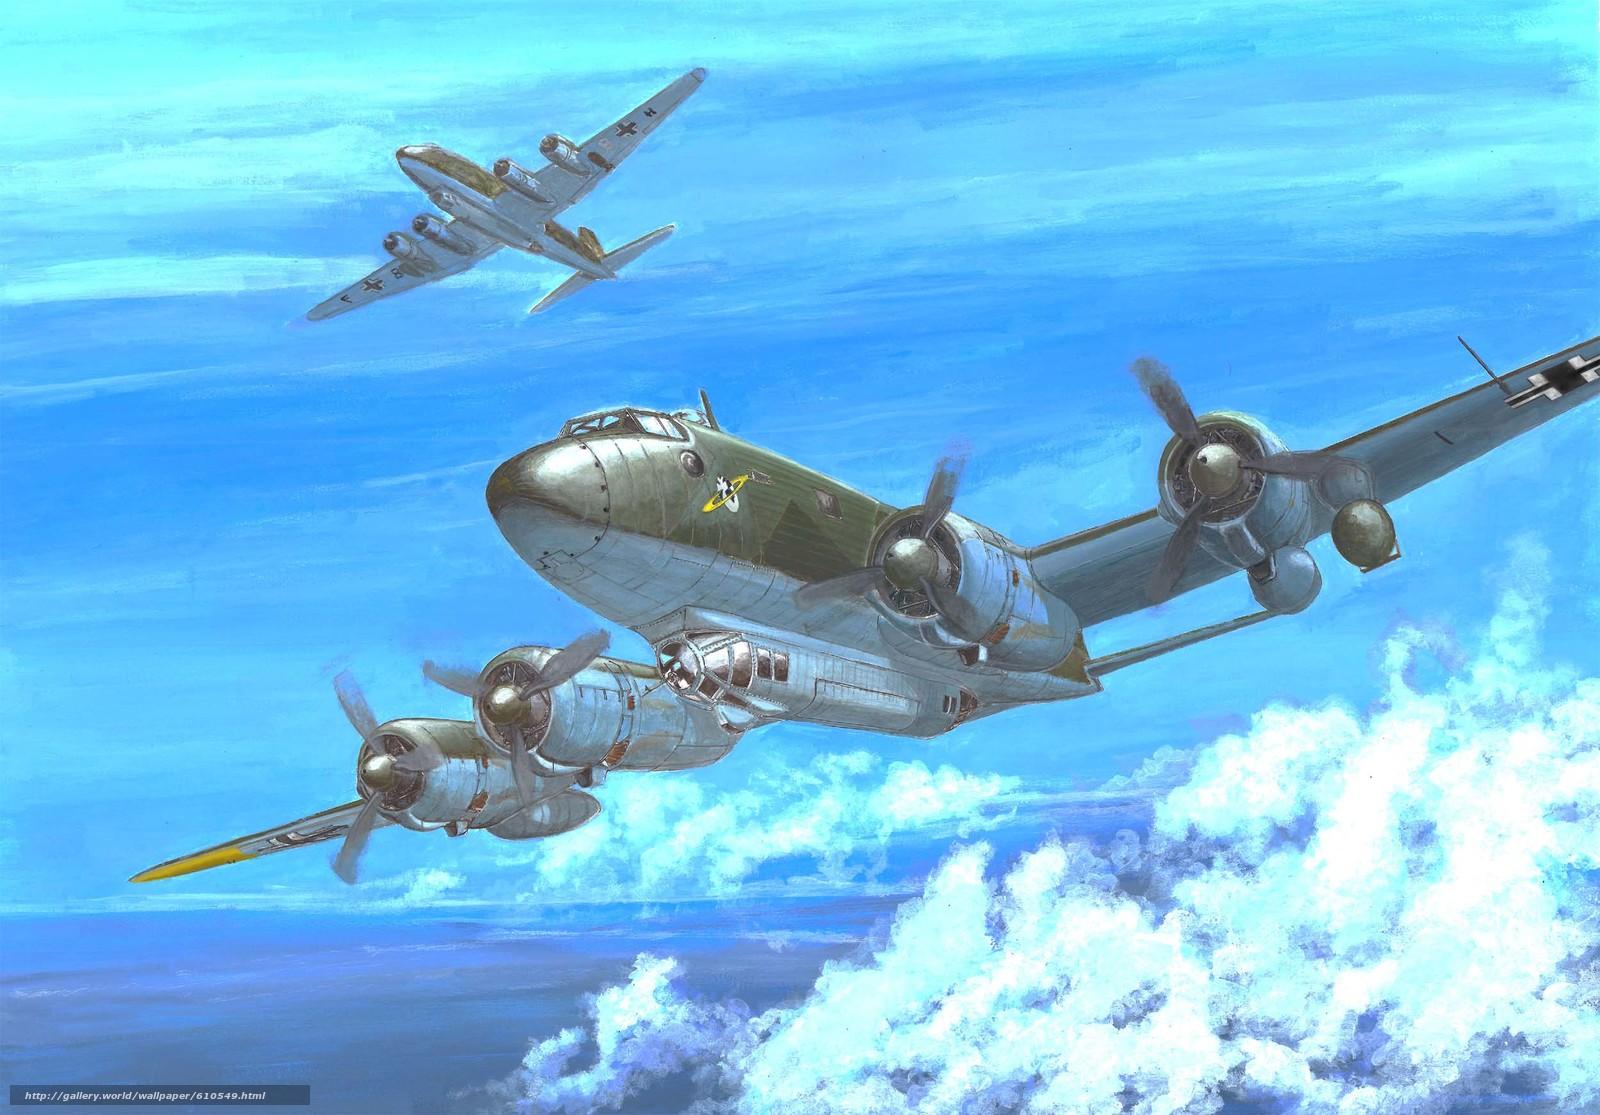 Download wallpaper Art,  plane,  German,  Focke-Wulf Fw 200C-3 Condor free desktop wallpaper in the resolution 2500x1742 — picture №610549